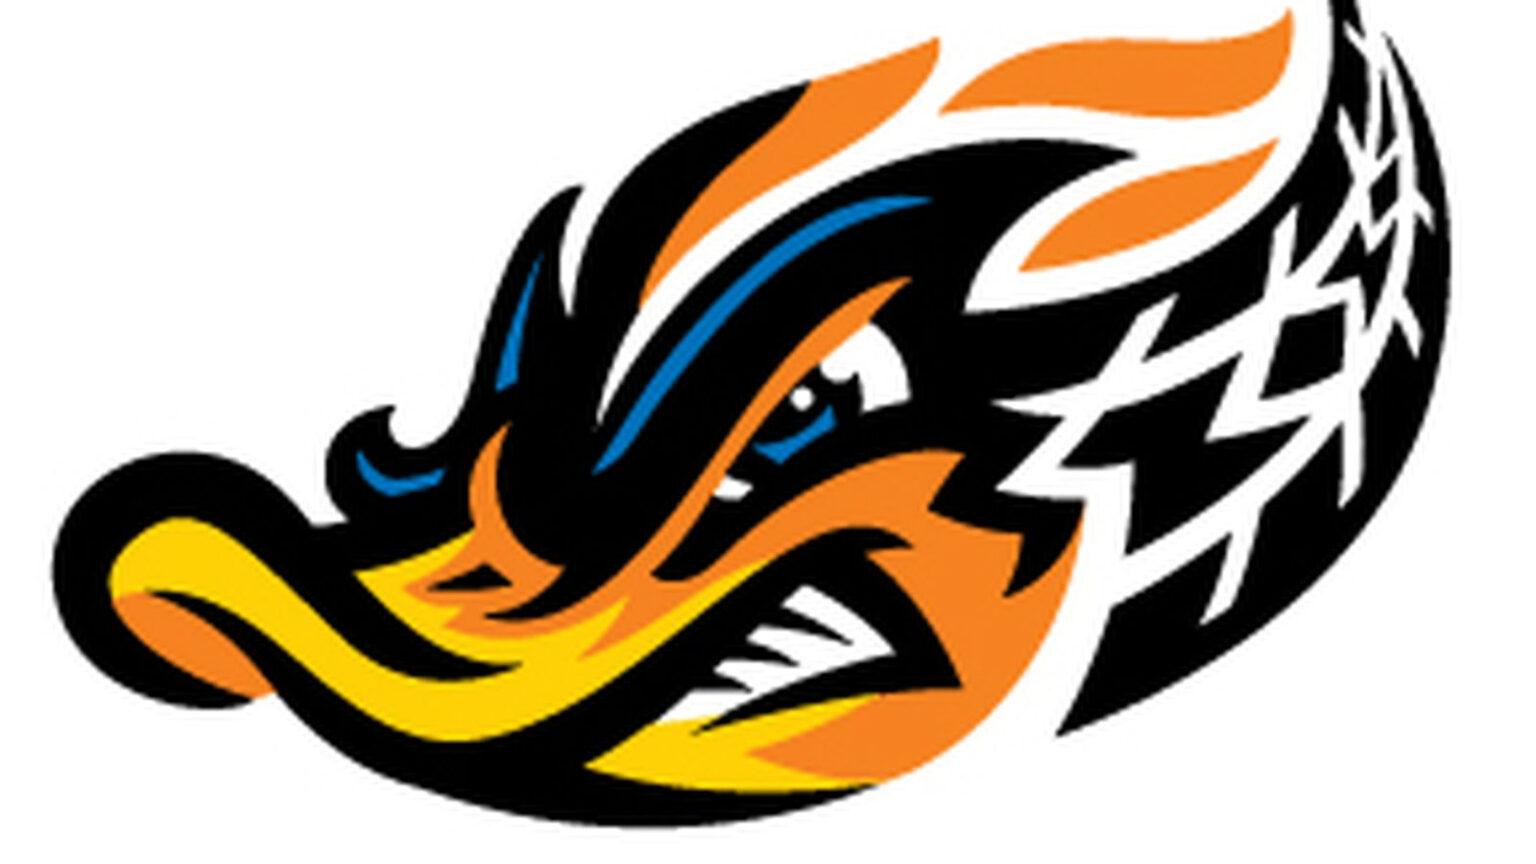 Akron Rubber Ducks Stadium Seating Chart | www